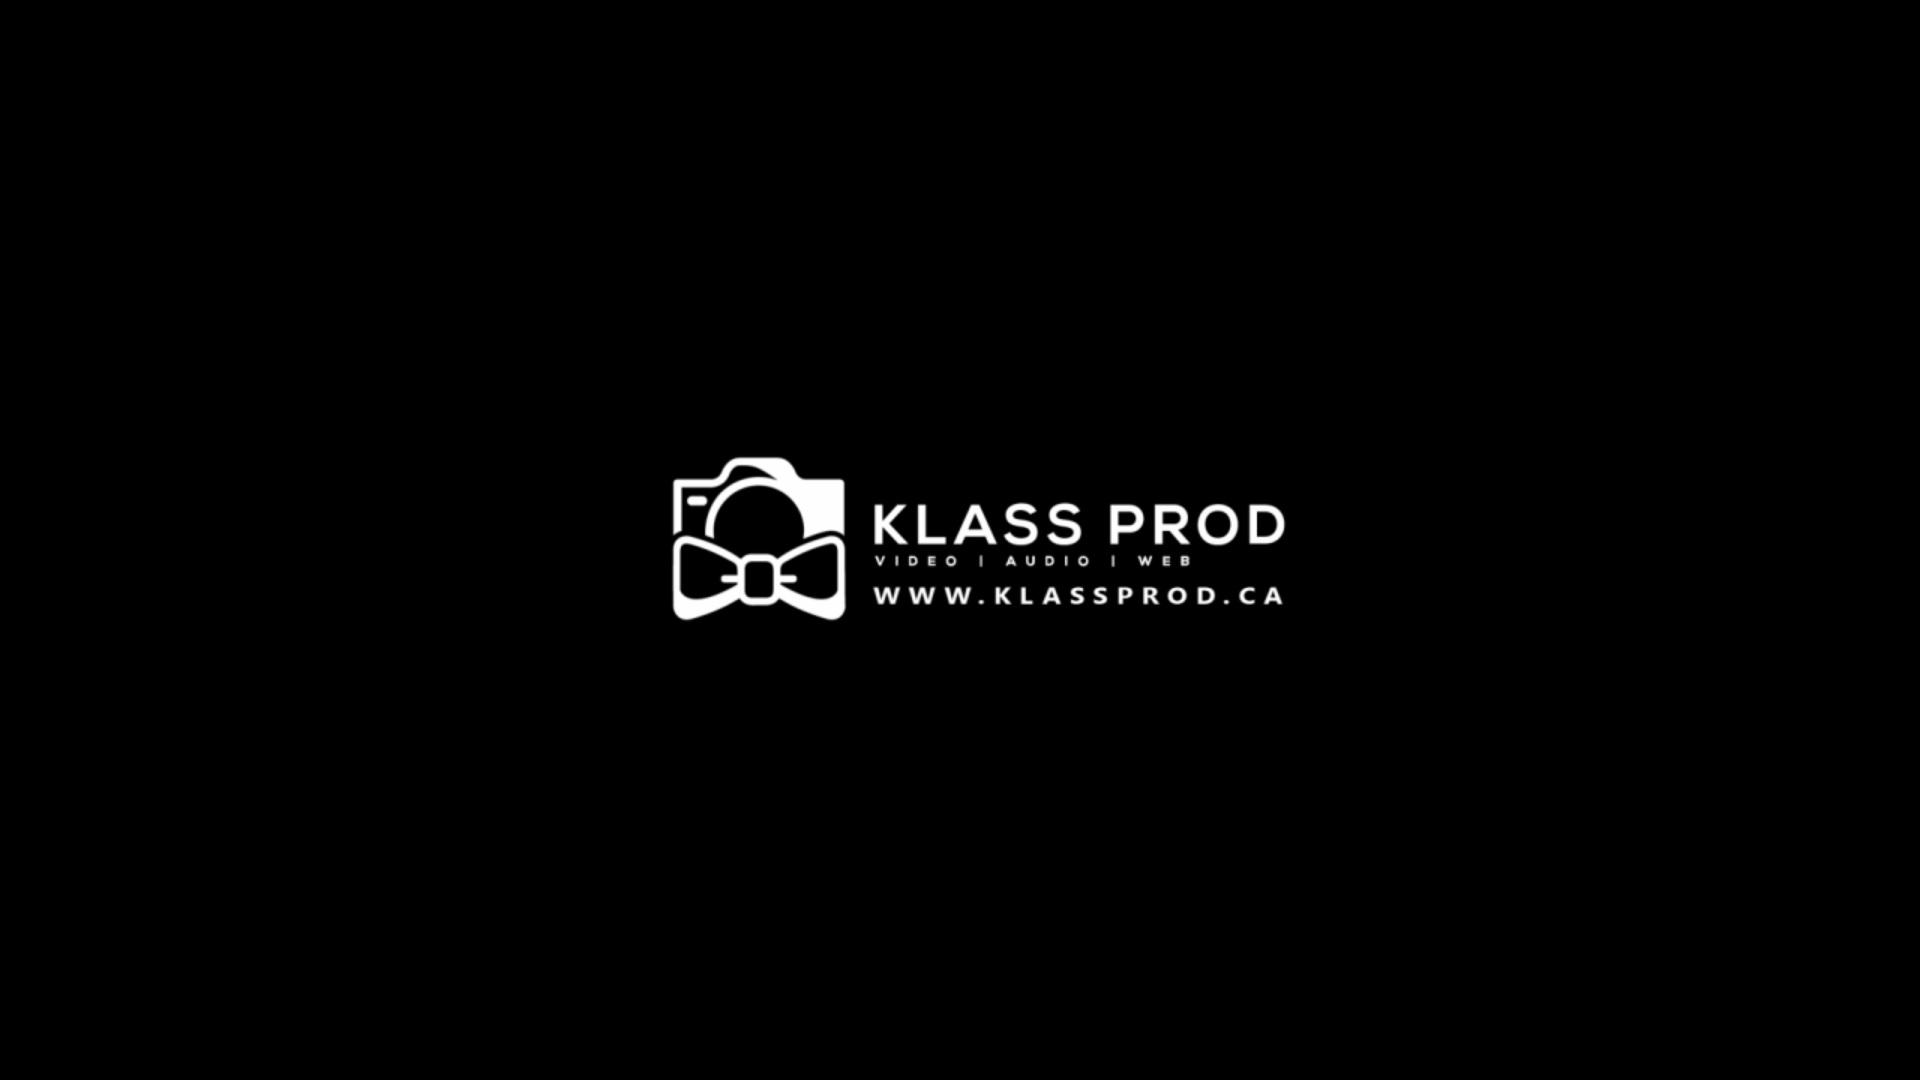 KLASS PROD